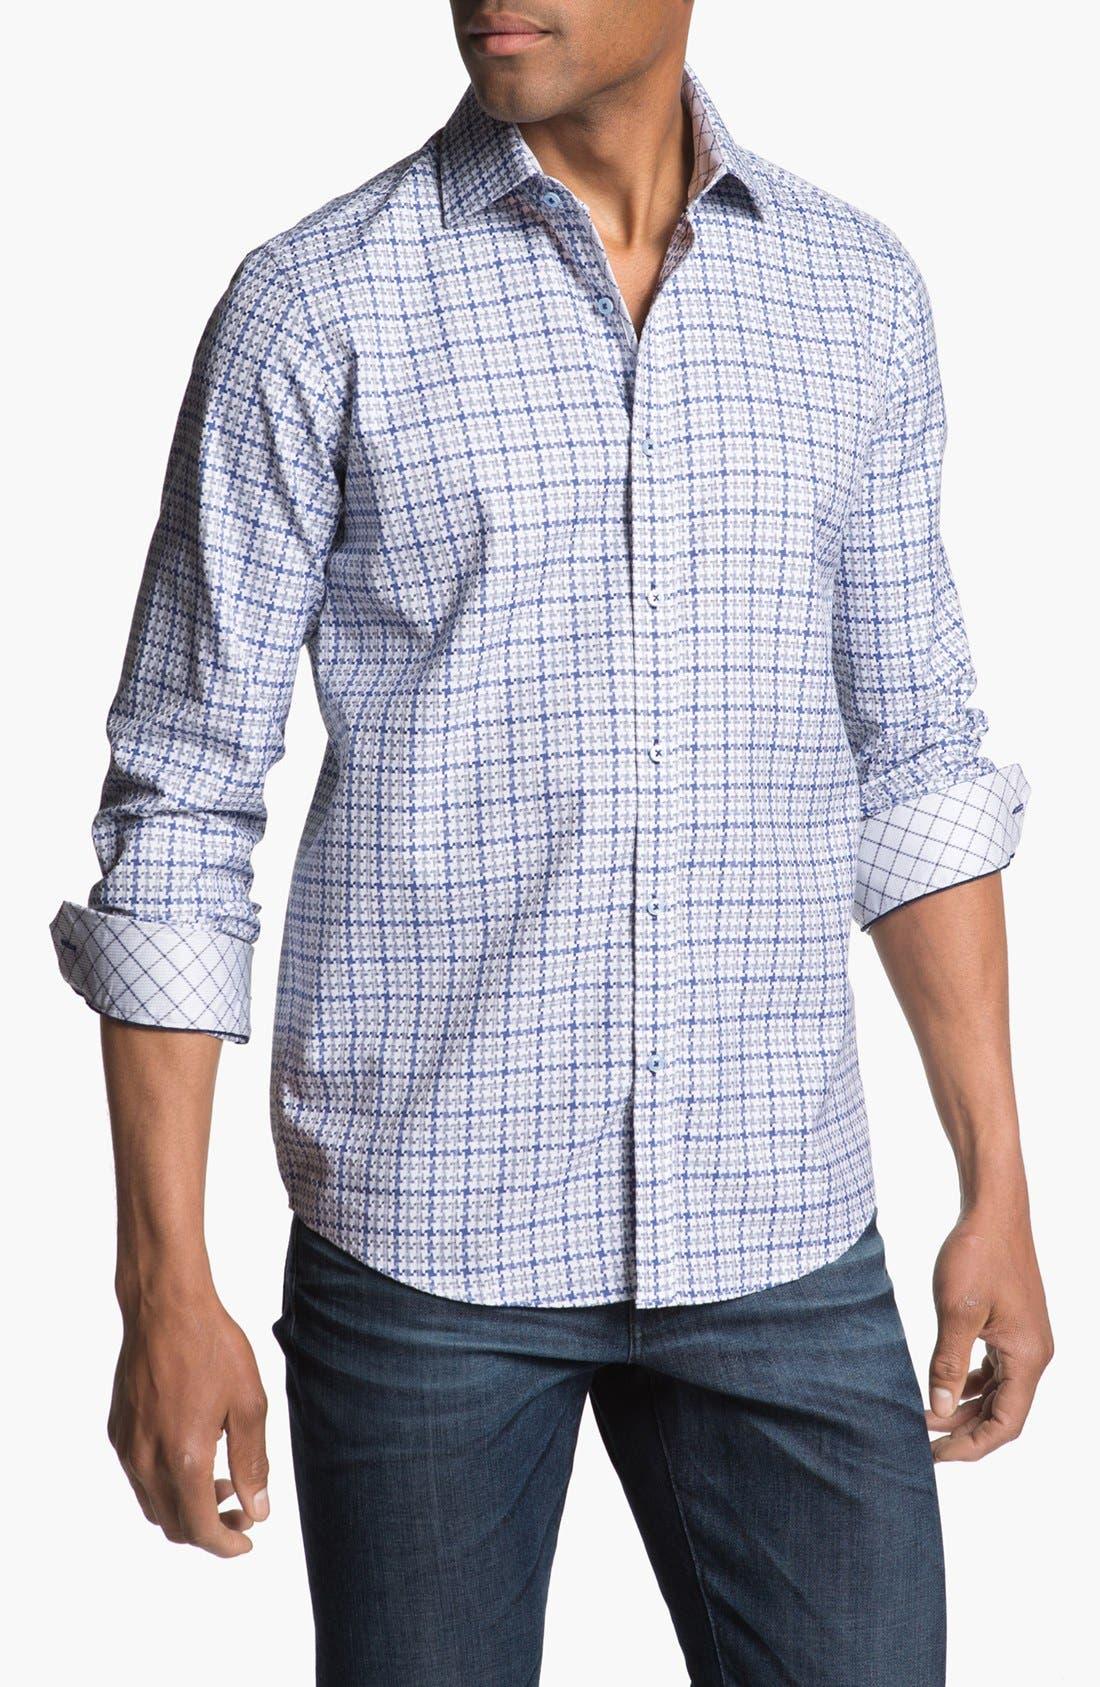 Main Image - Report Collection Regular Fit Sport Shirt